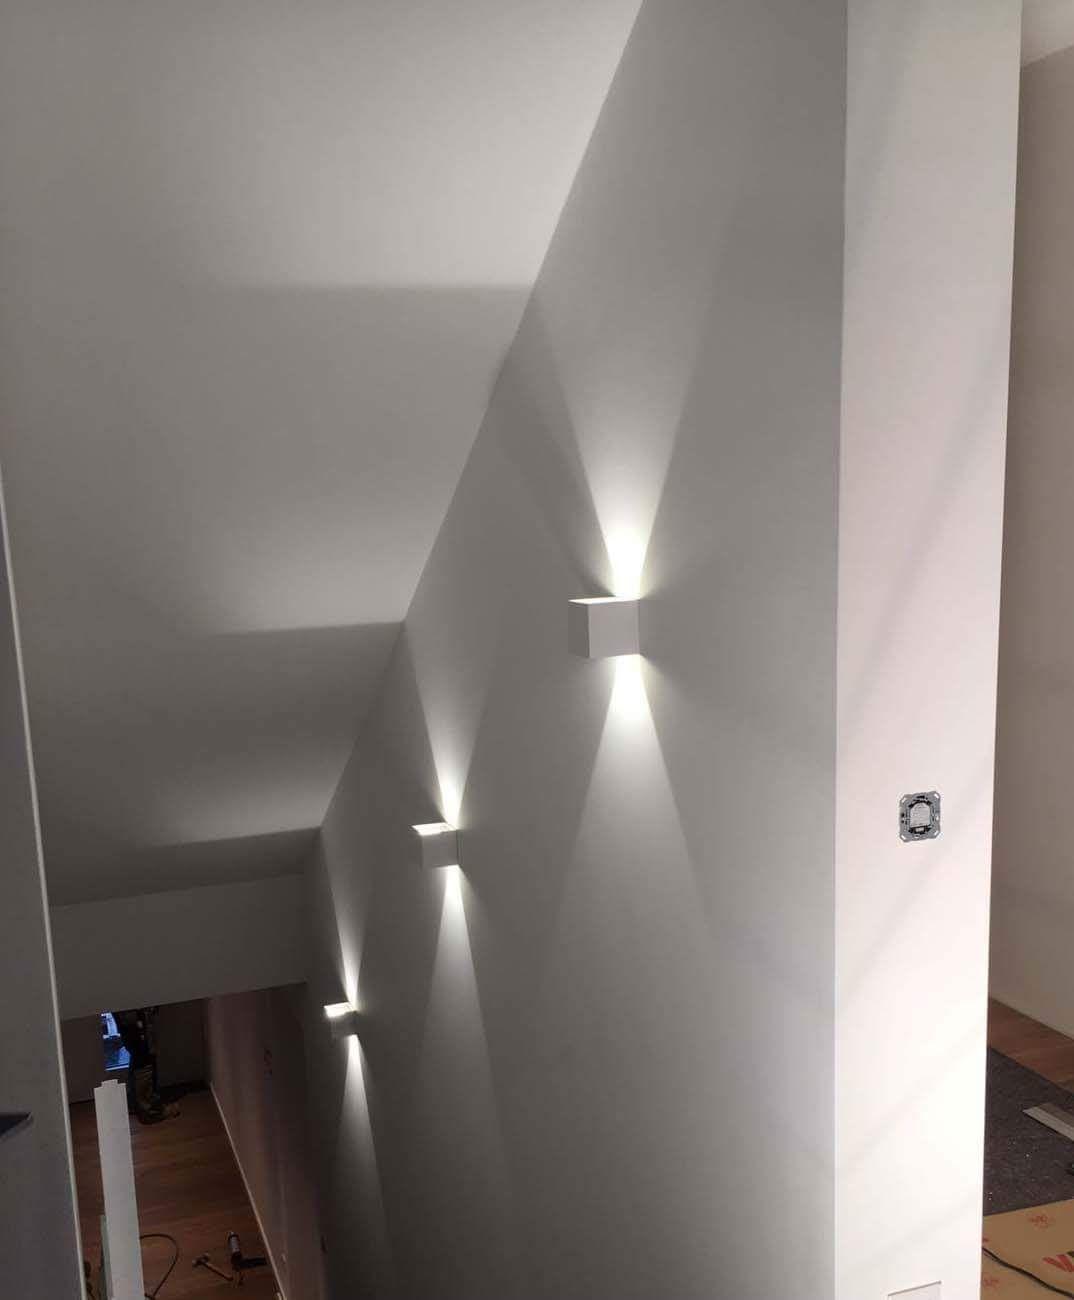 15068505 1139410096108039 3813526875303593707 O Jpg 1 074 1 300 Pixel Lampen Treppenhaus Treppenhaus Beleuchtung Treppe Haus